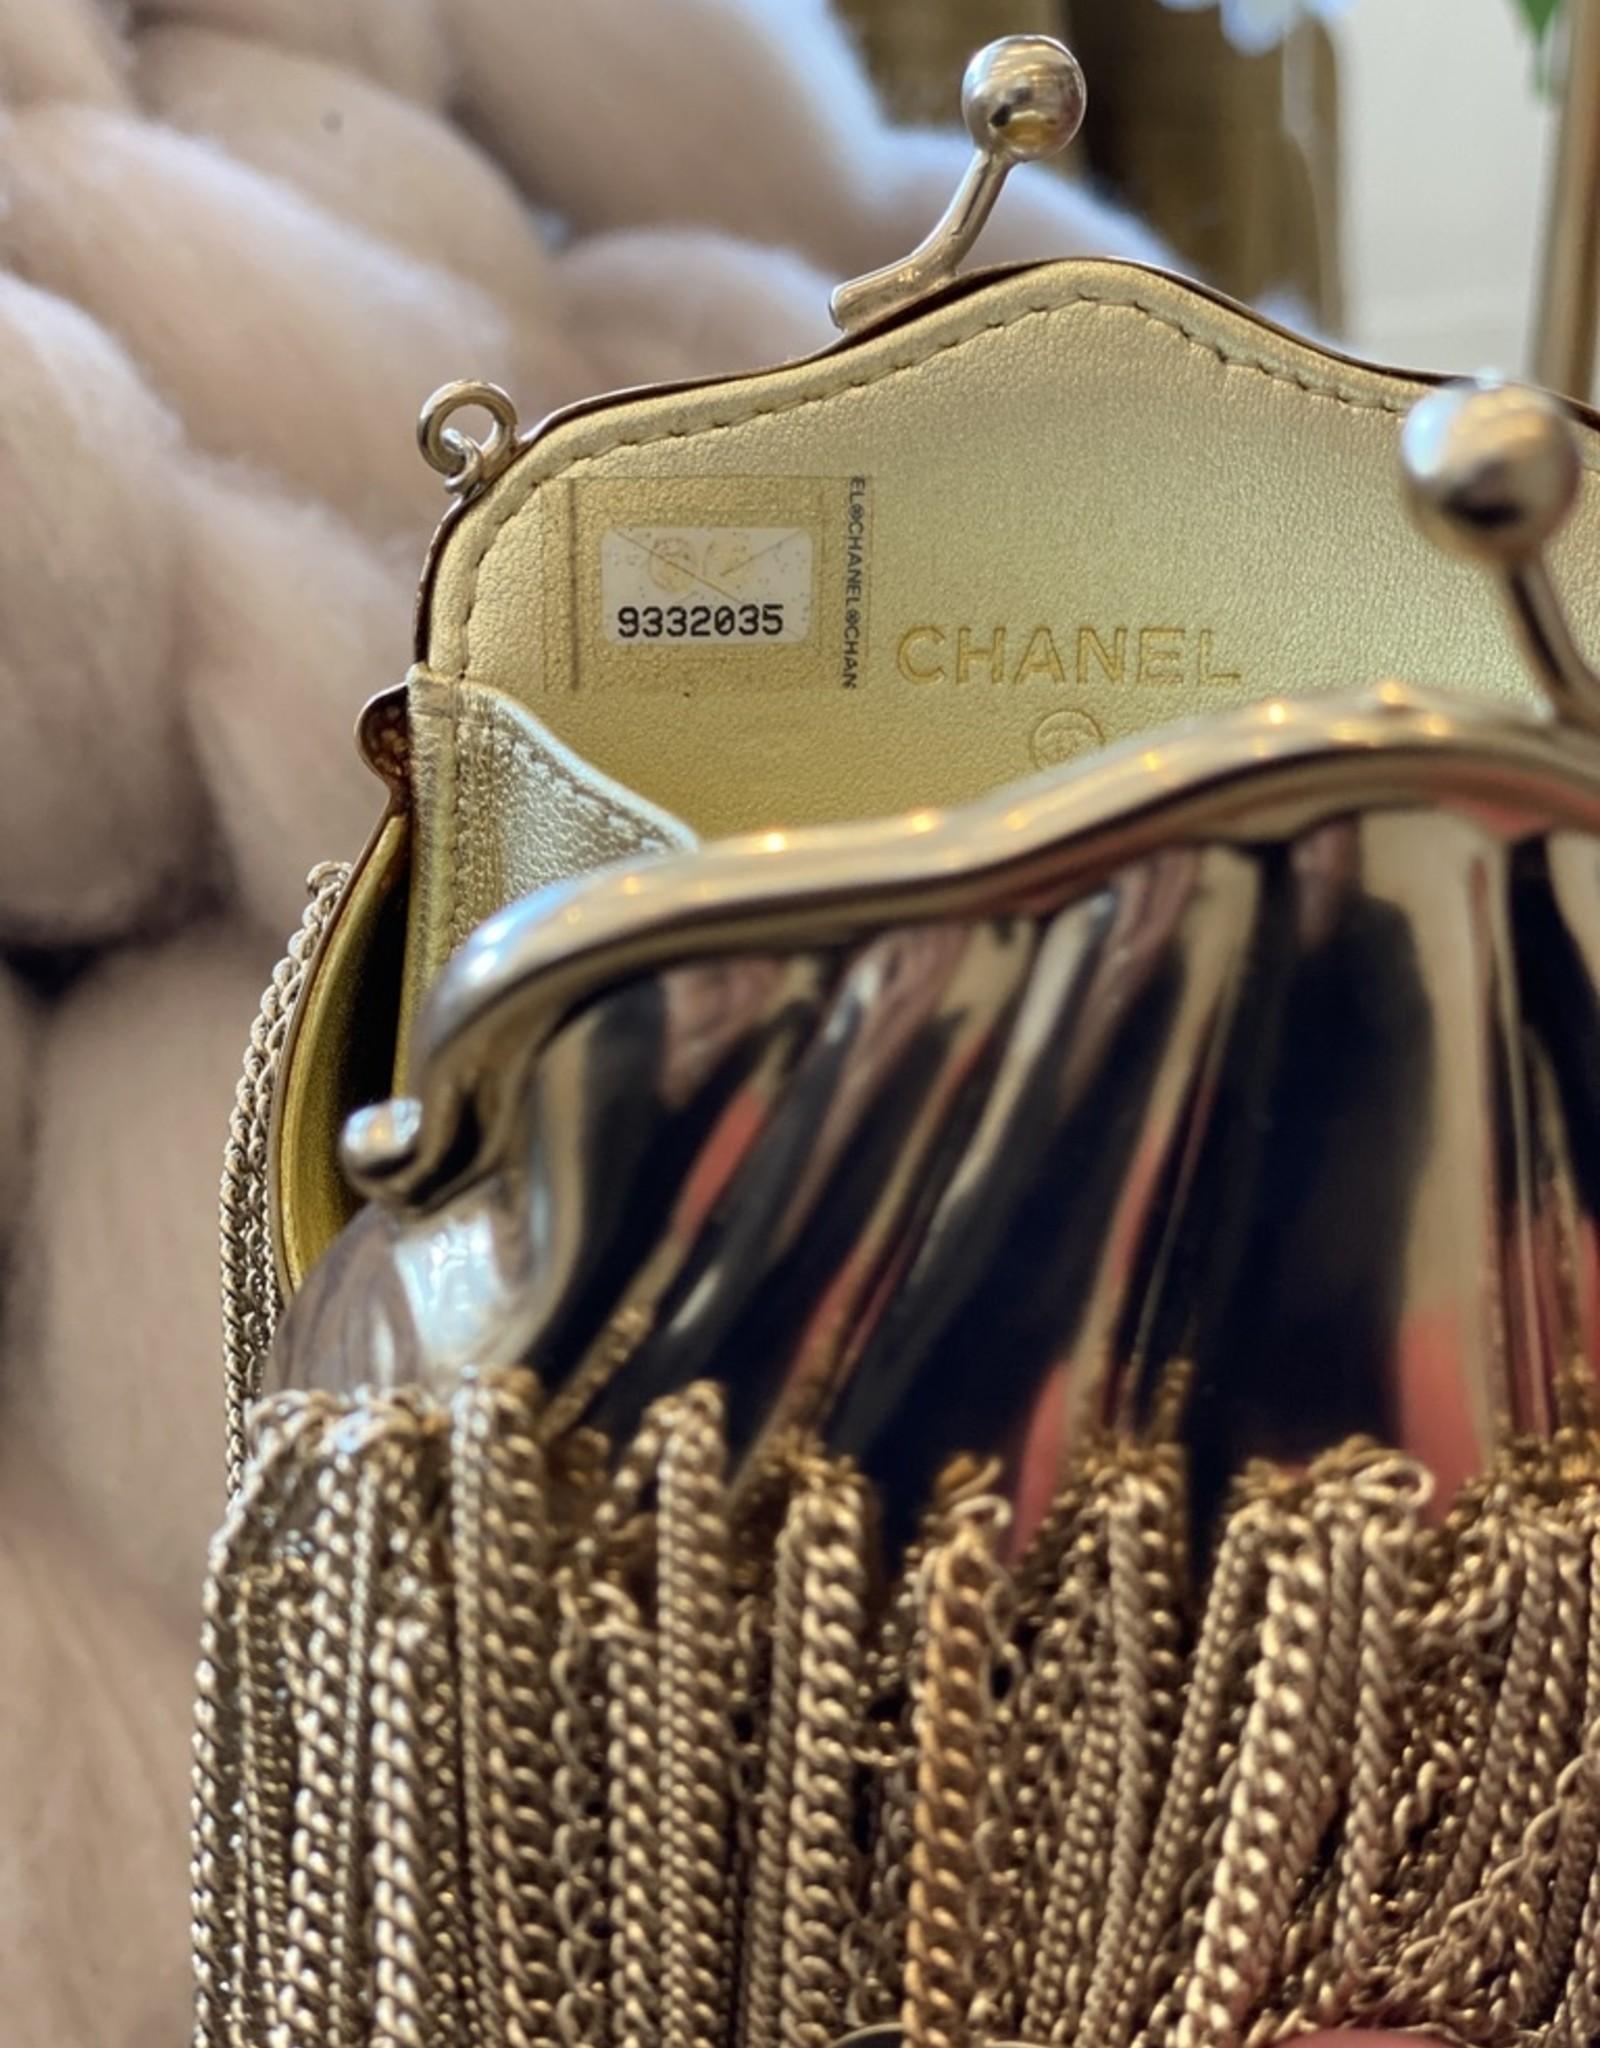 Chanel Chanel Rare Fringe Coin Purse (1990s Vintage)